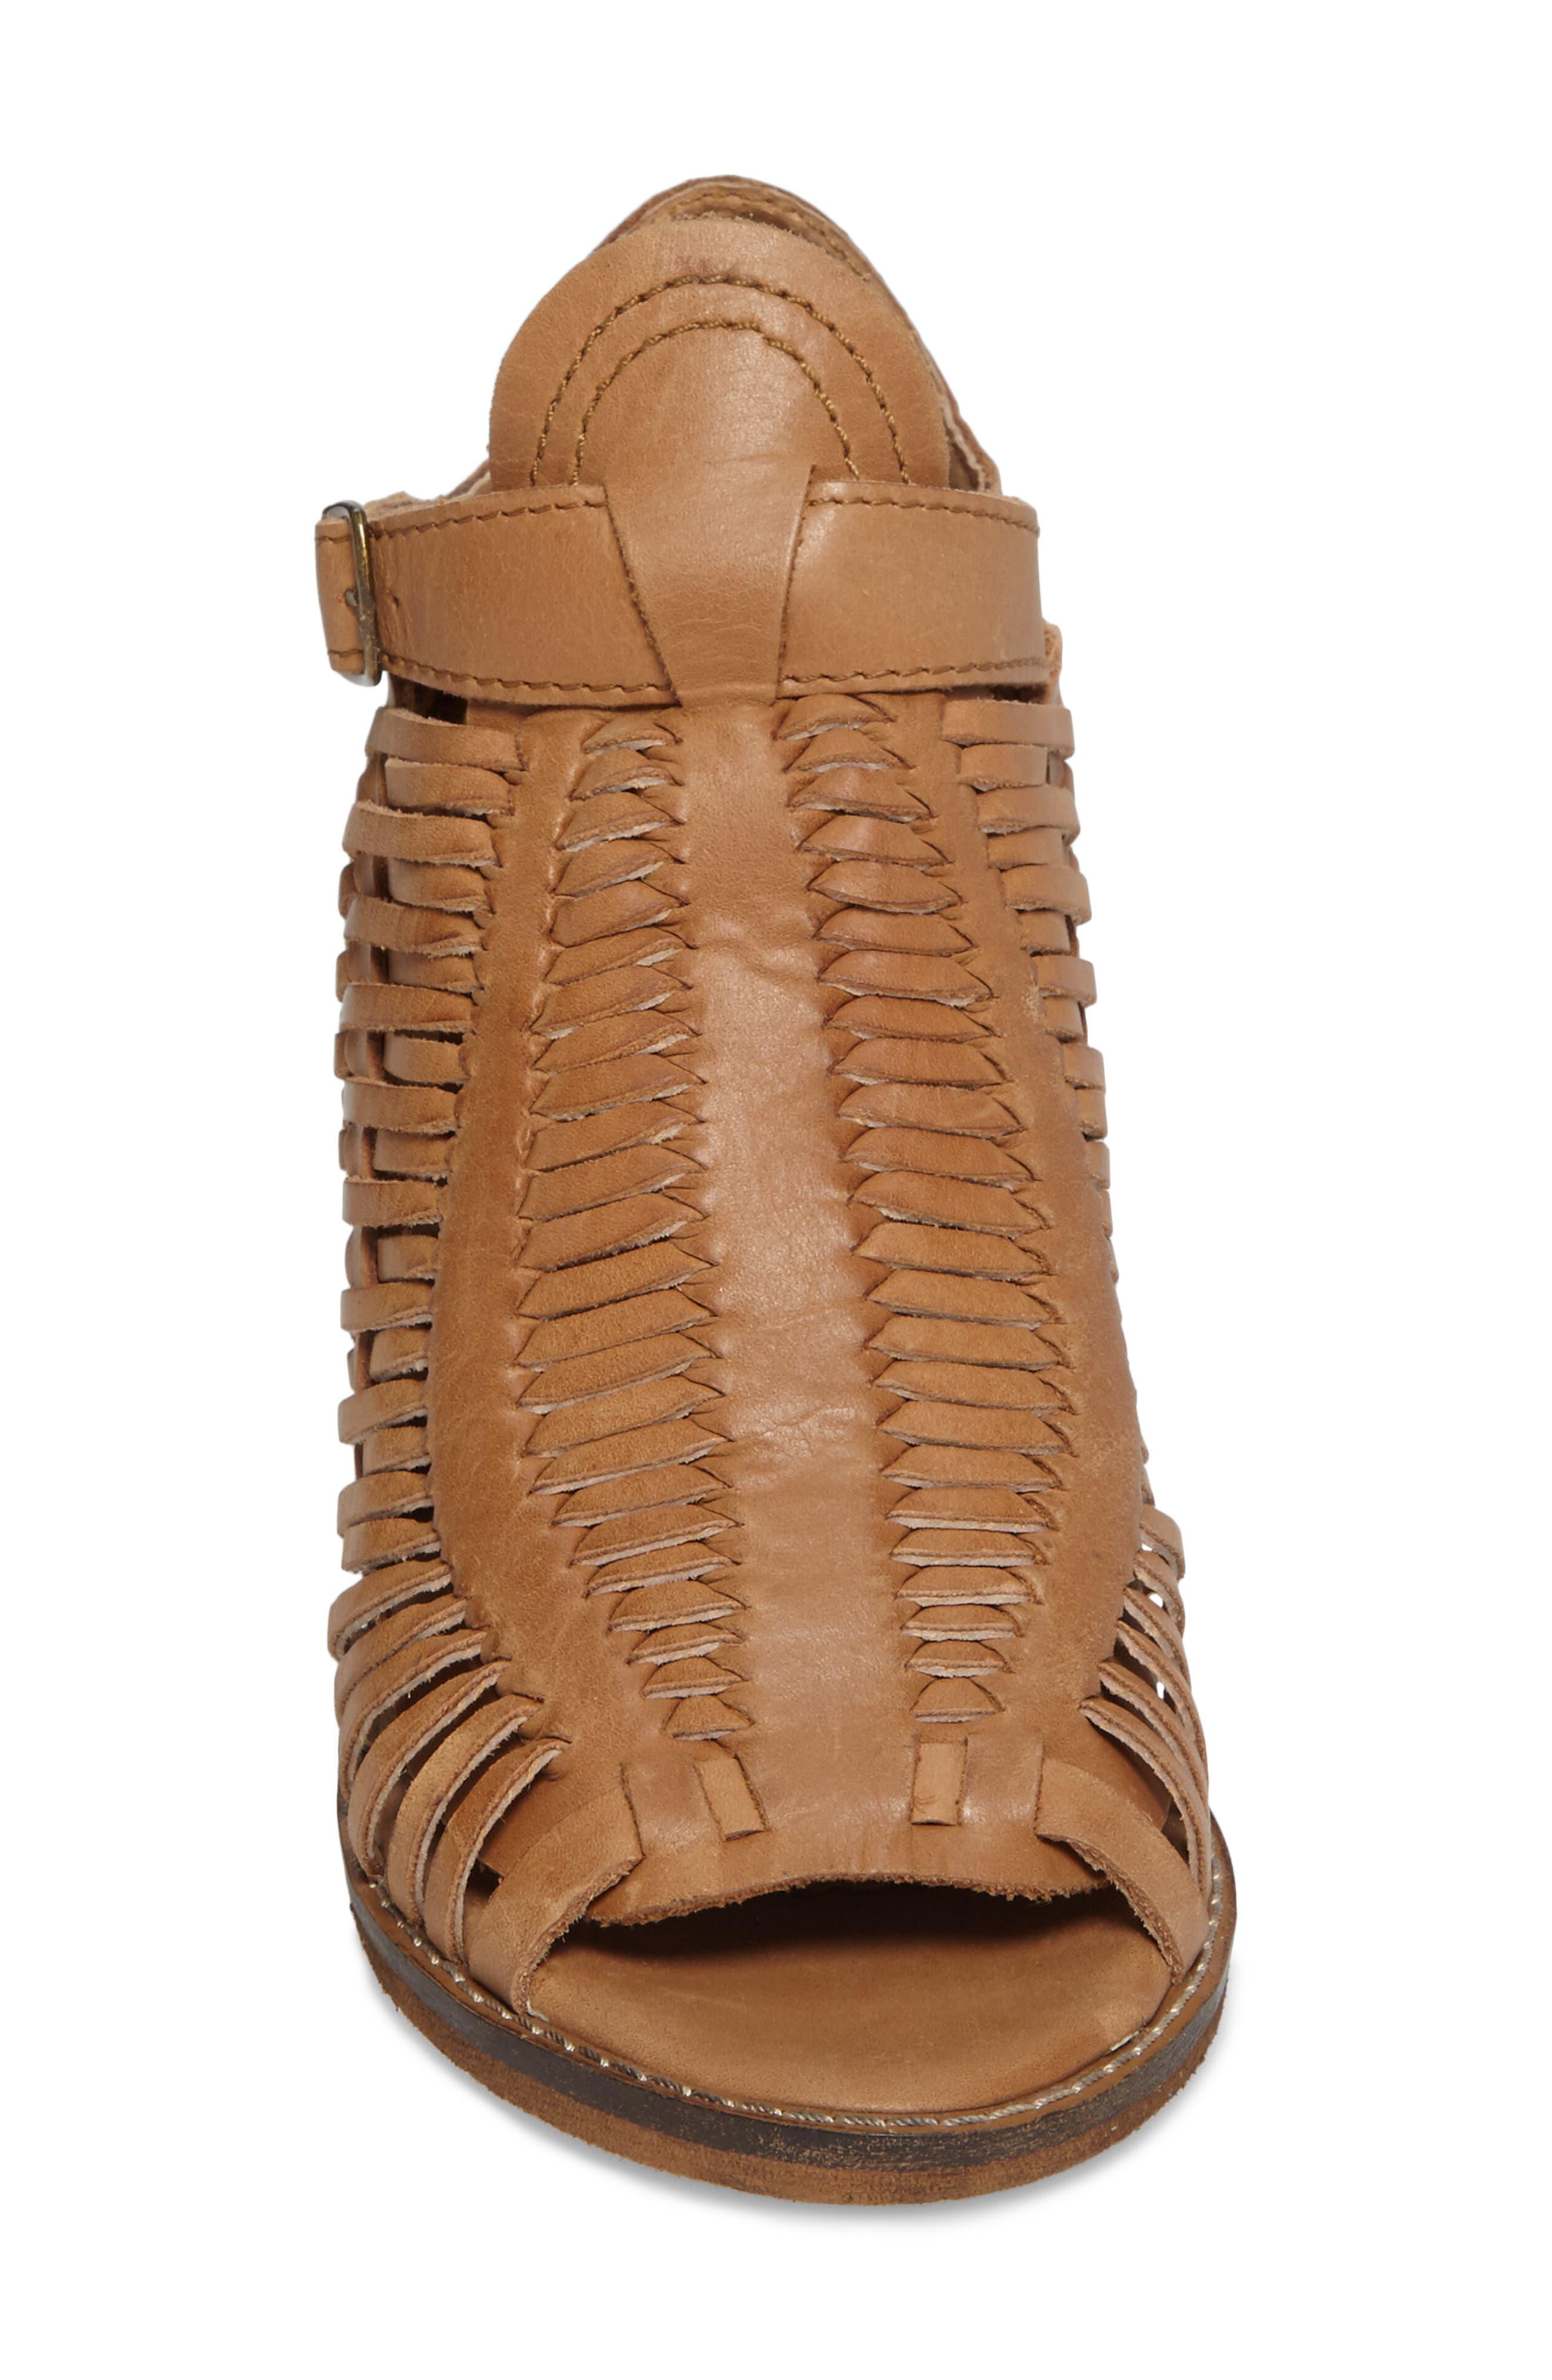 Killion Open Toe Bootie,                             Alternate thumbnail 4, color,                             Tan Leather